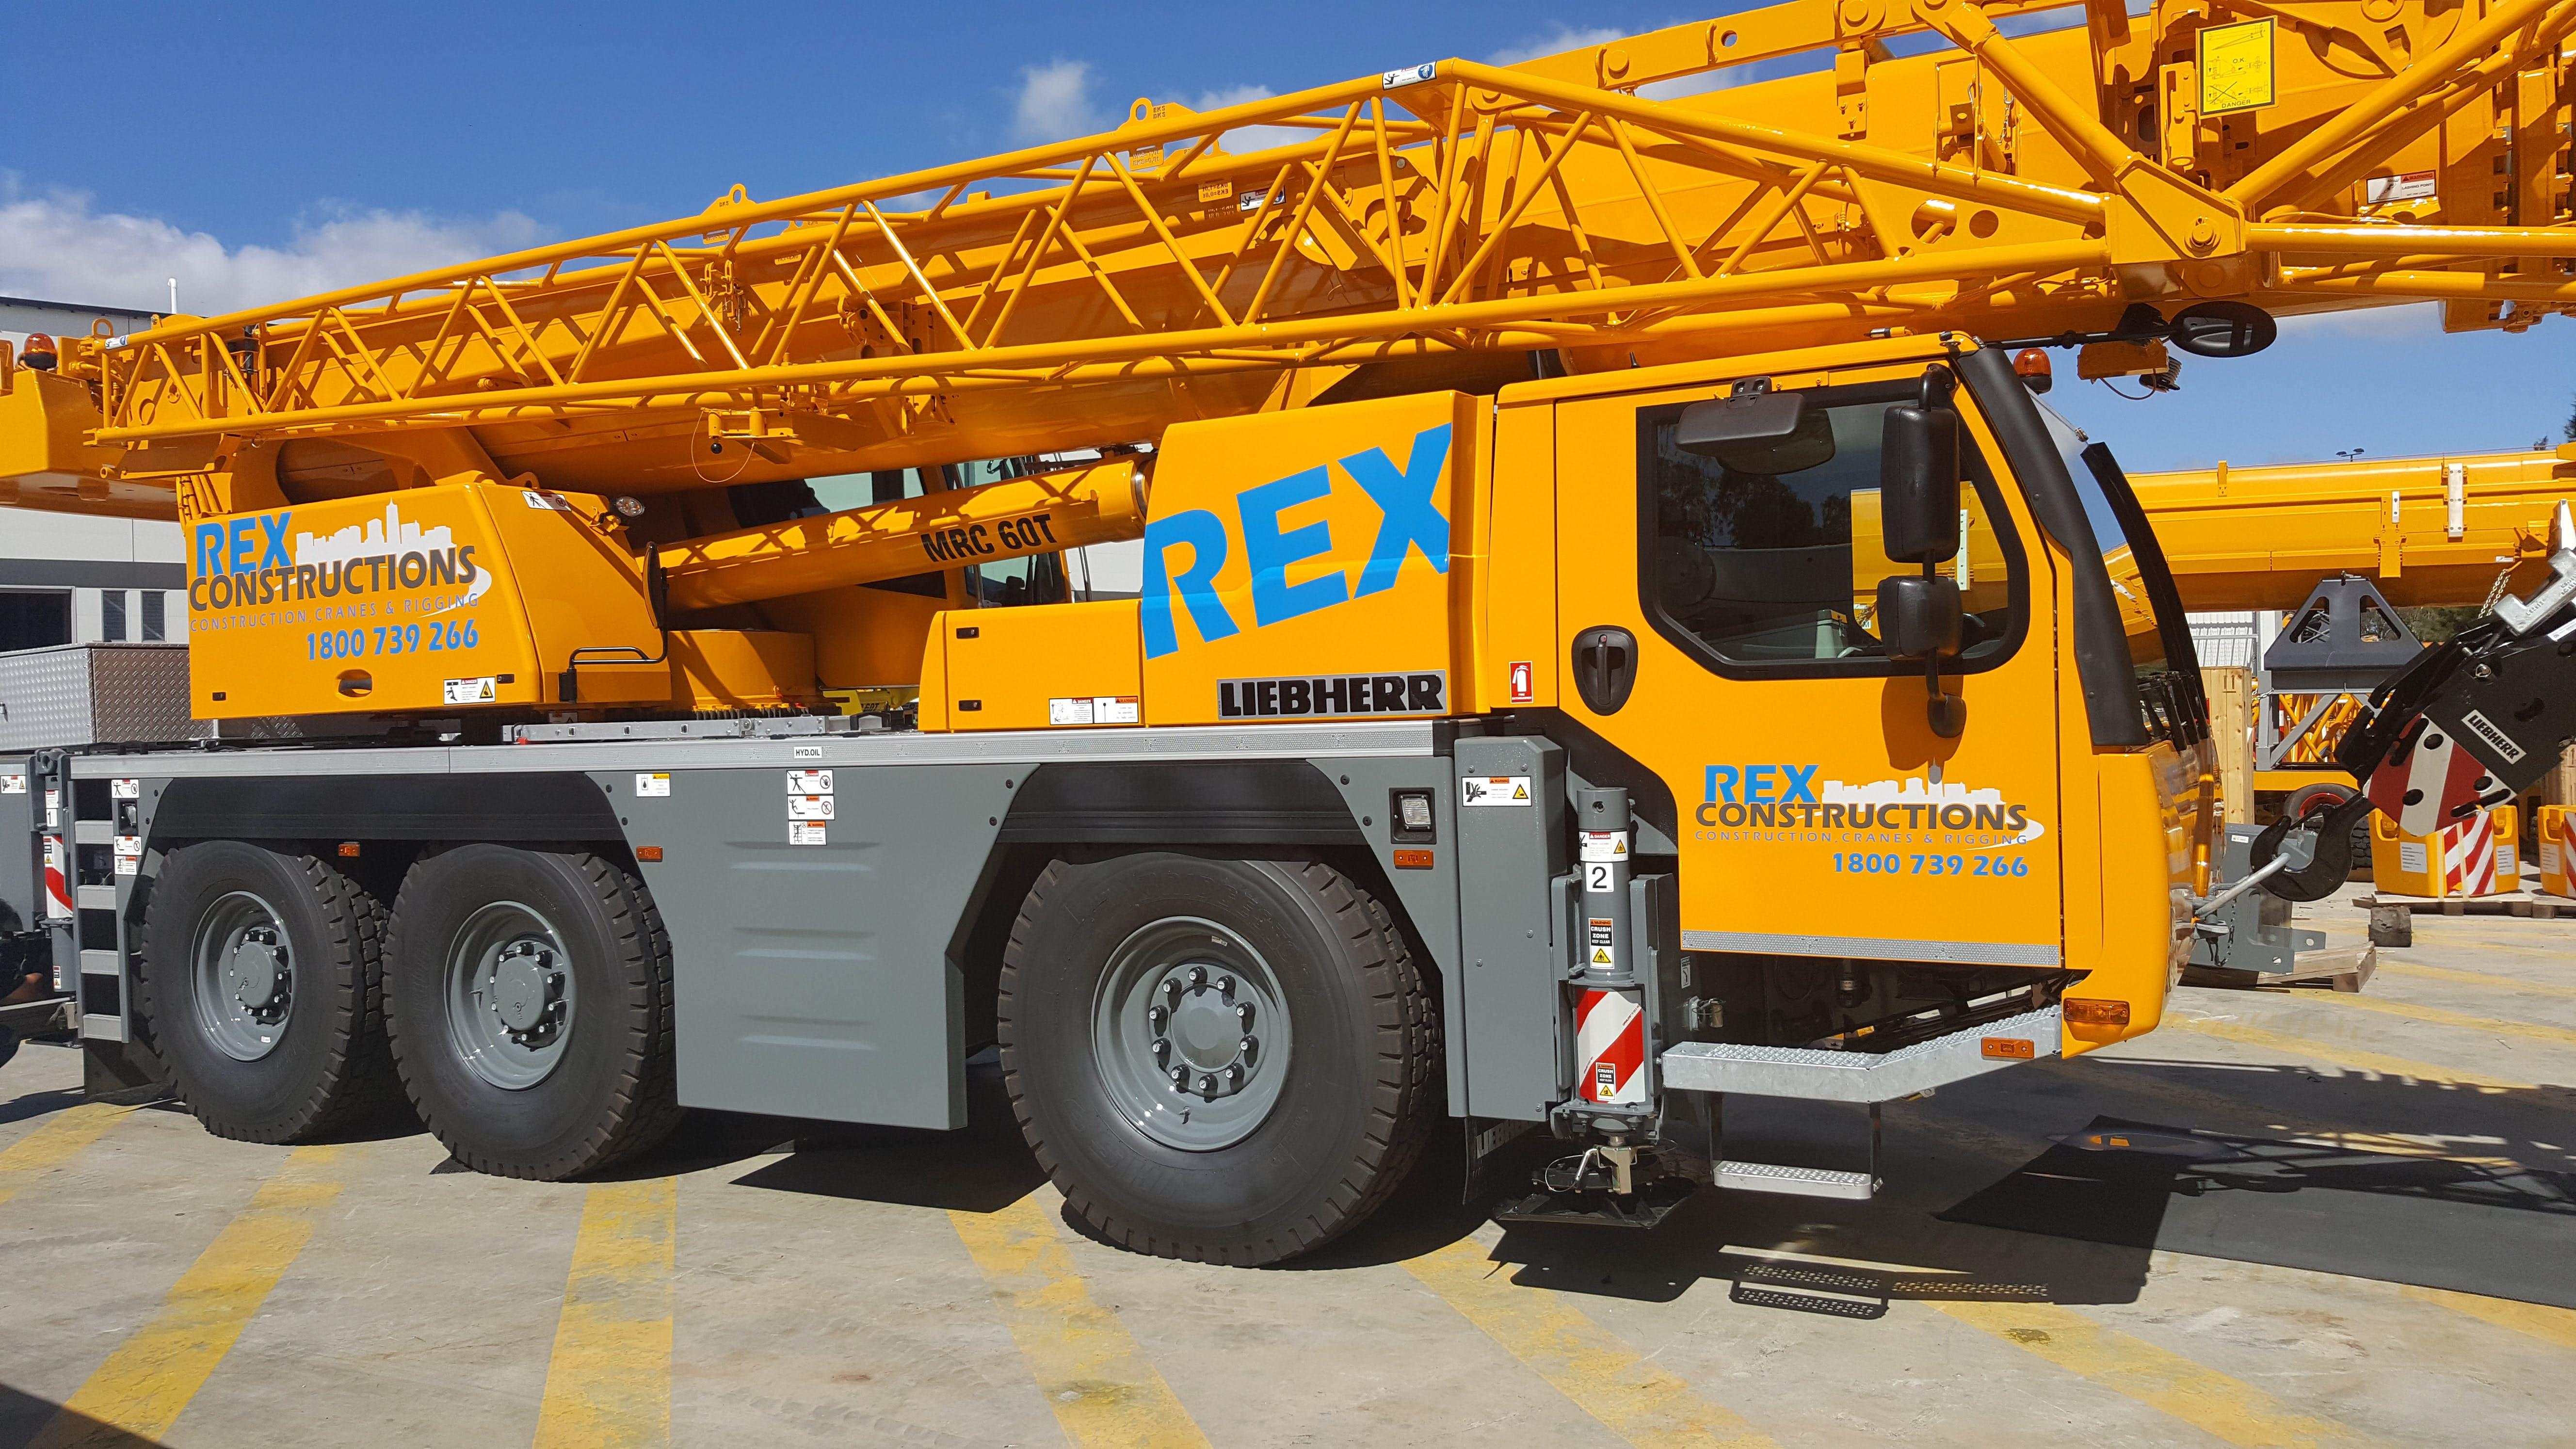 Rex Constructions Pty Ltd